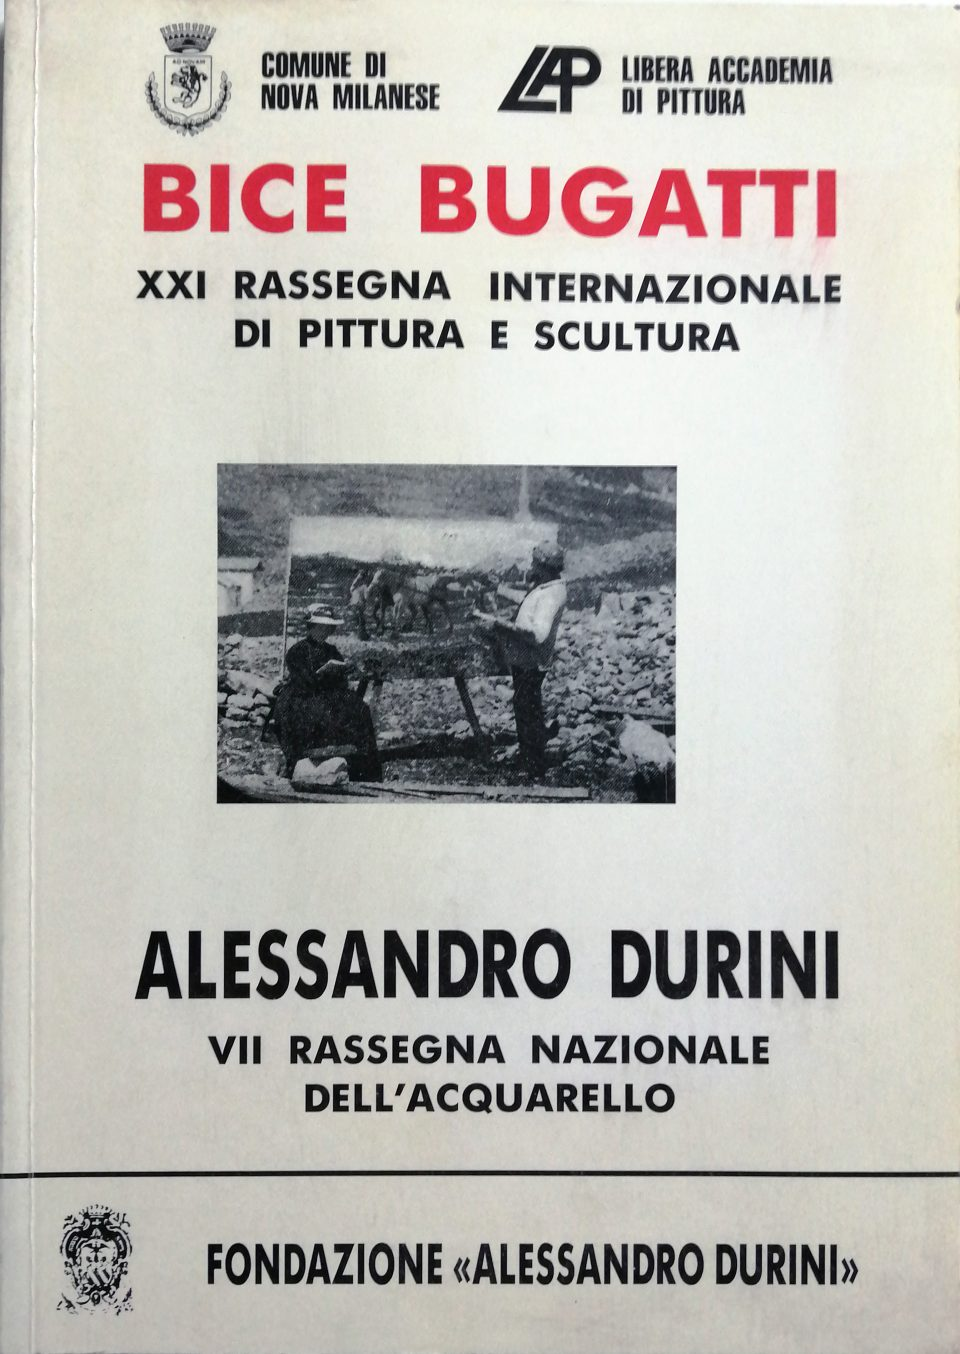 1991 Bice Bigatti XXI Rassegna Nova Milanese 960x1354 - Bibliography/ Catalogues